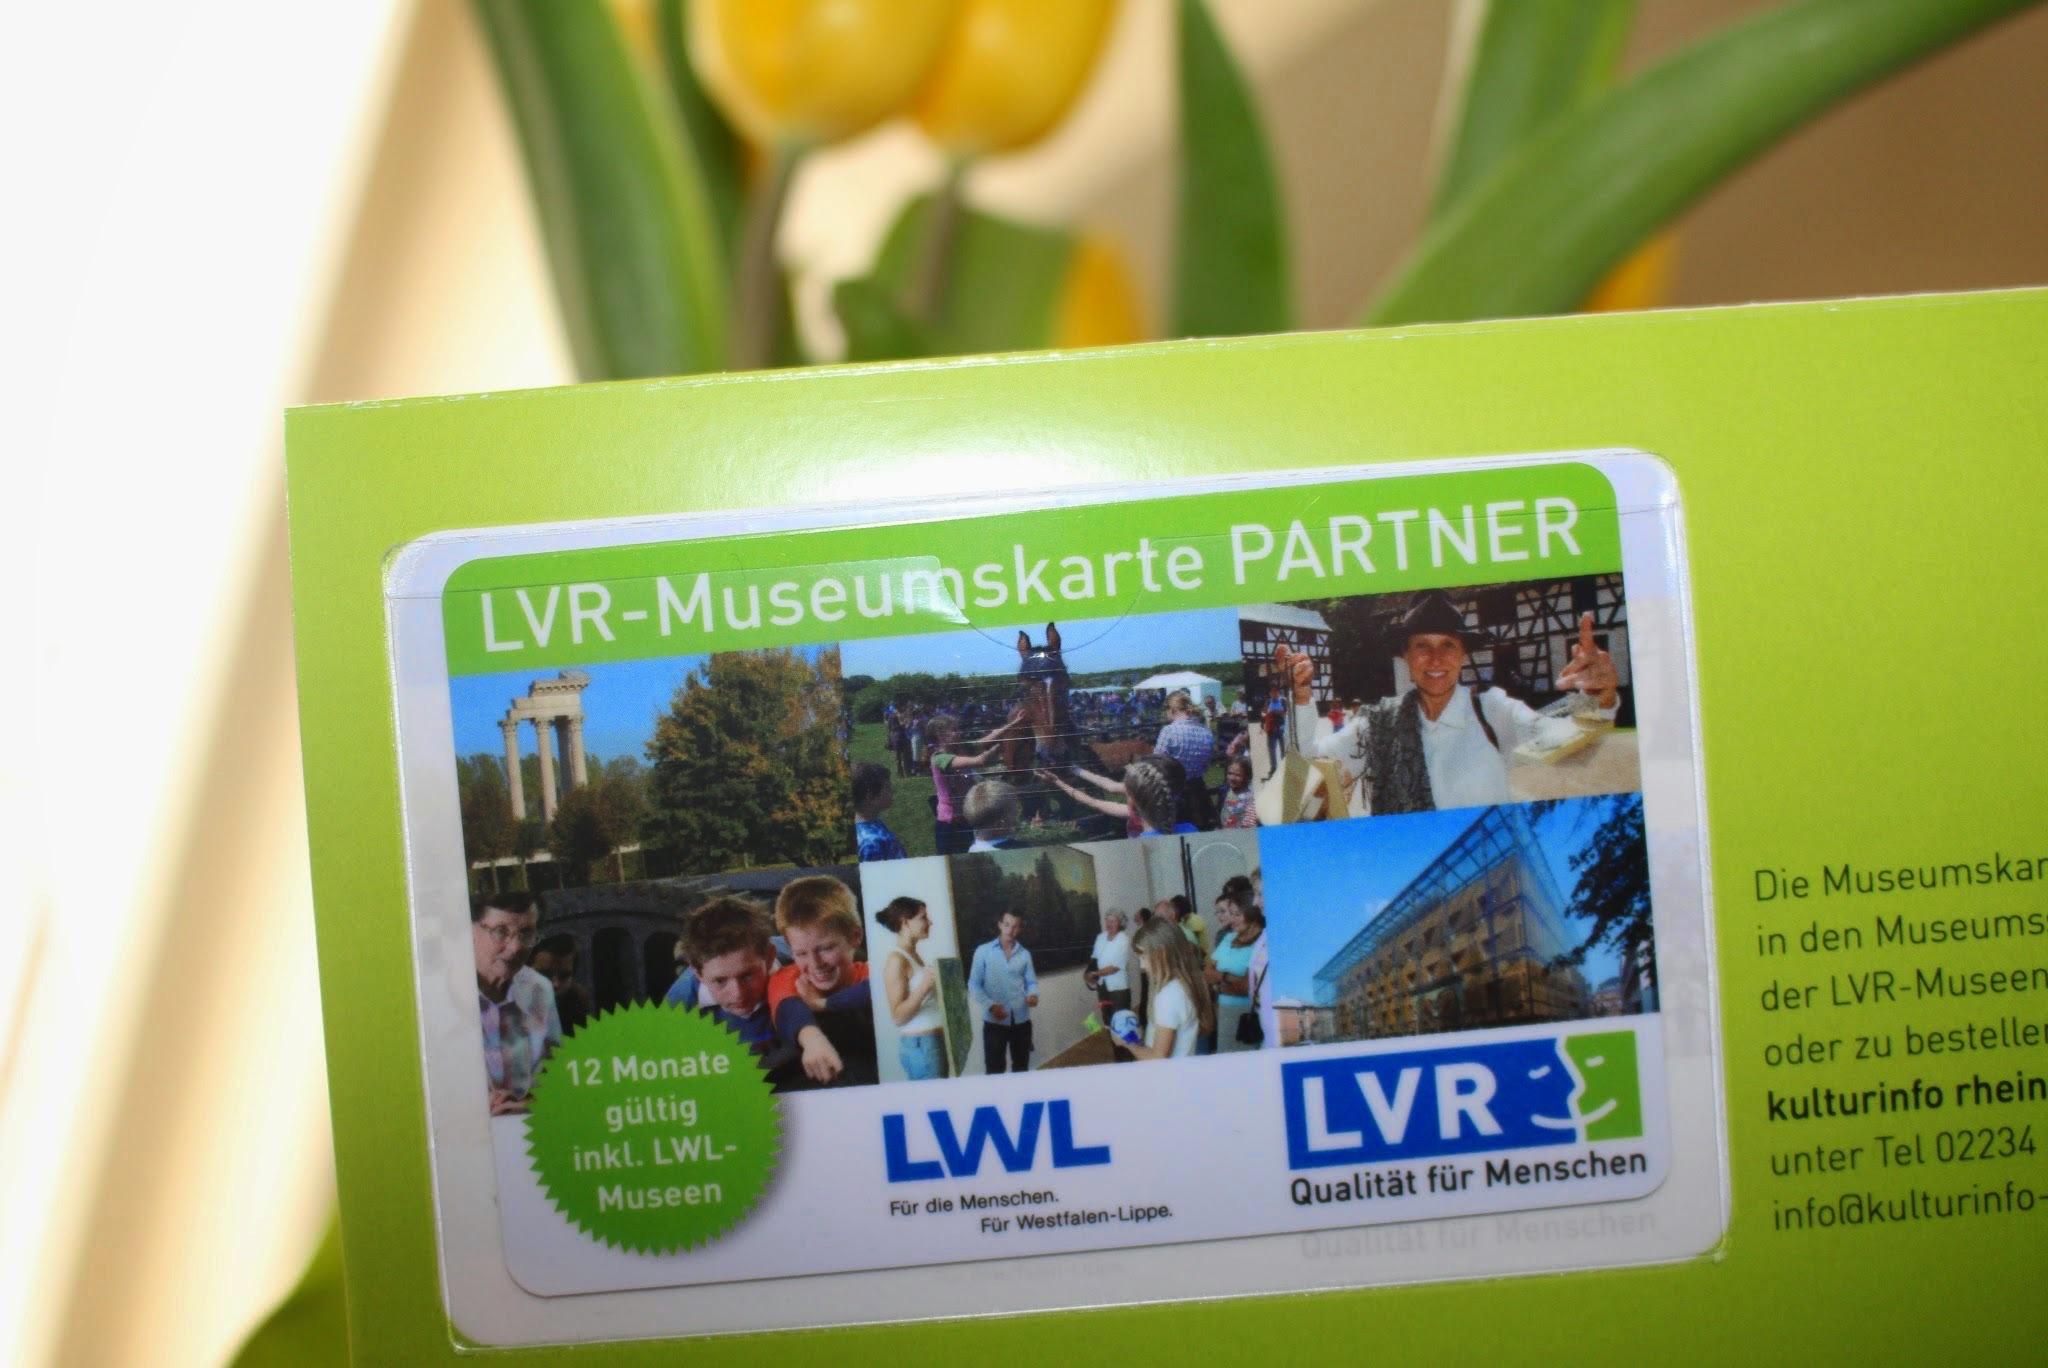 LVR_museumskarte1